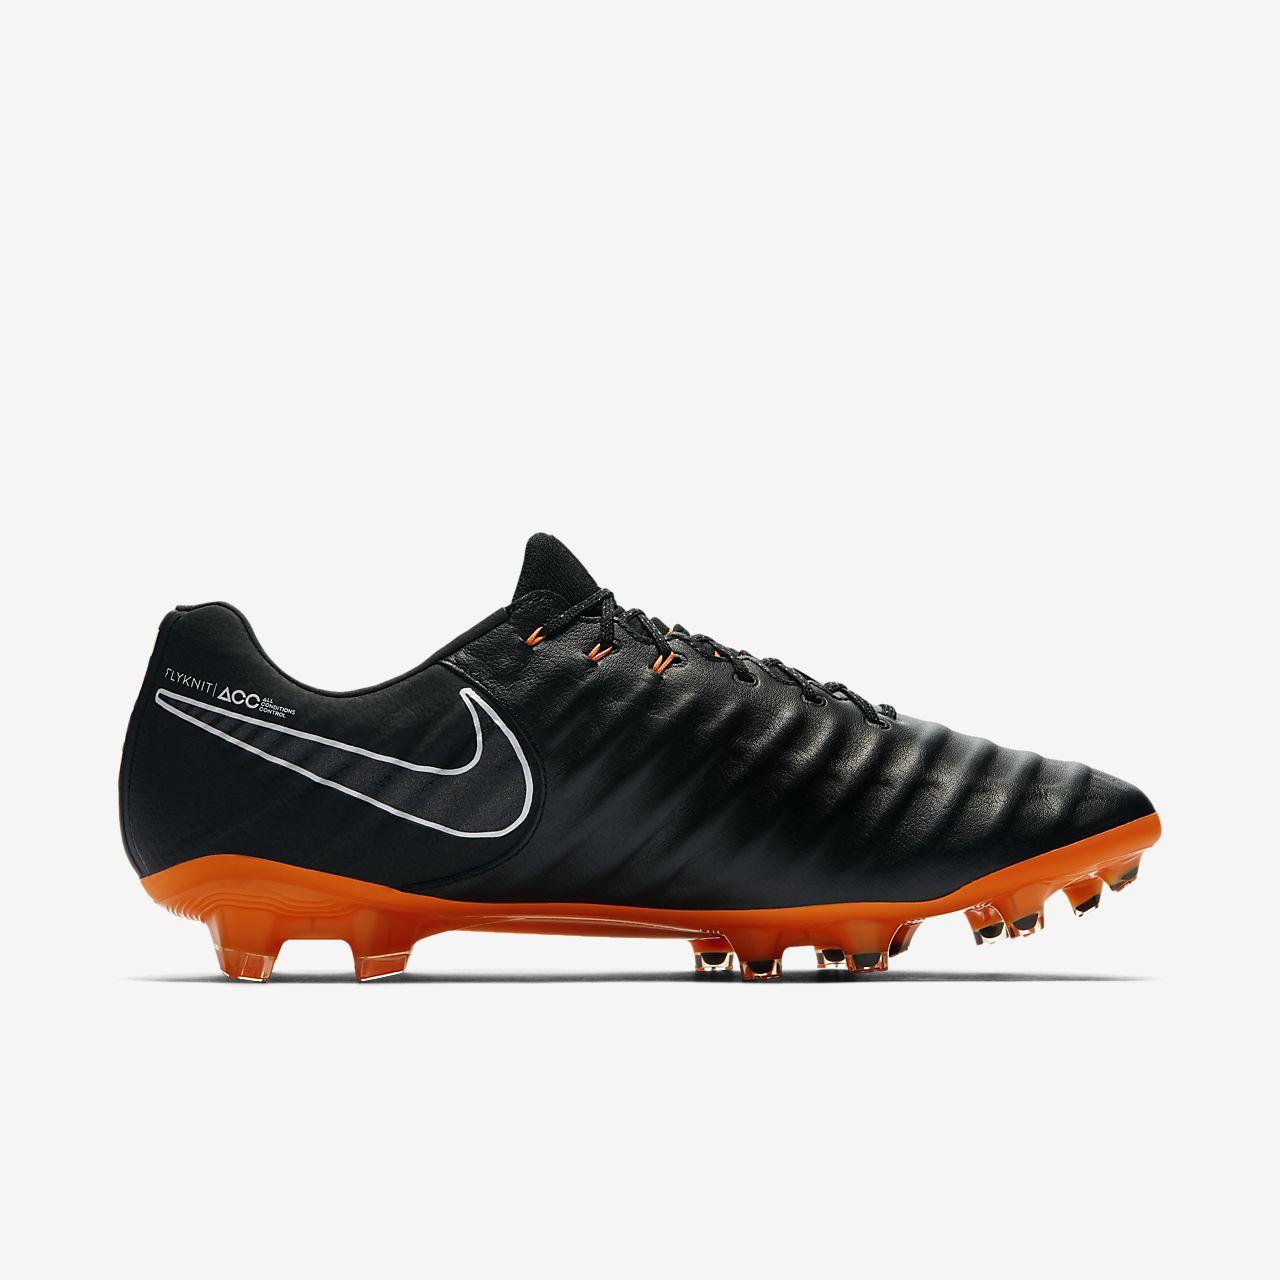 chaussure de football crampons pour terrain sec nike. Black Bedroom Furniture Sets. Home Design Ideas